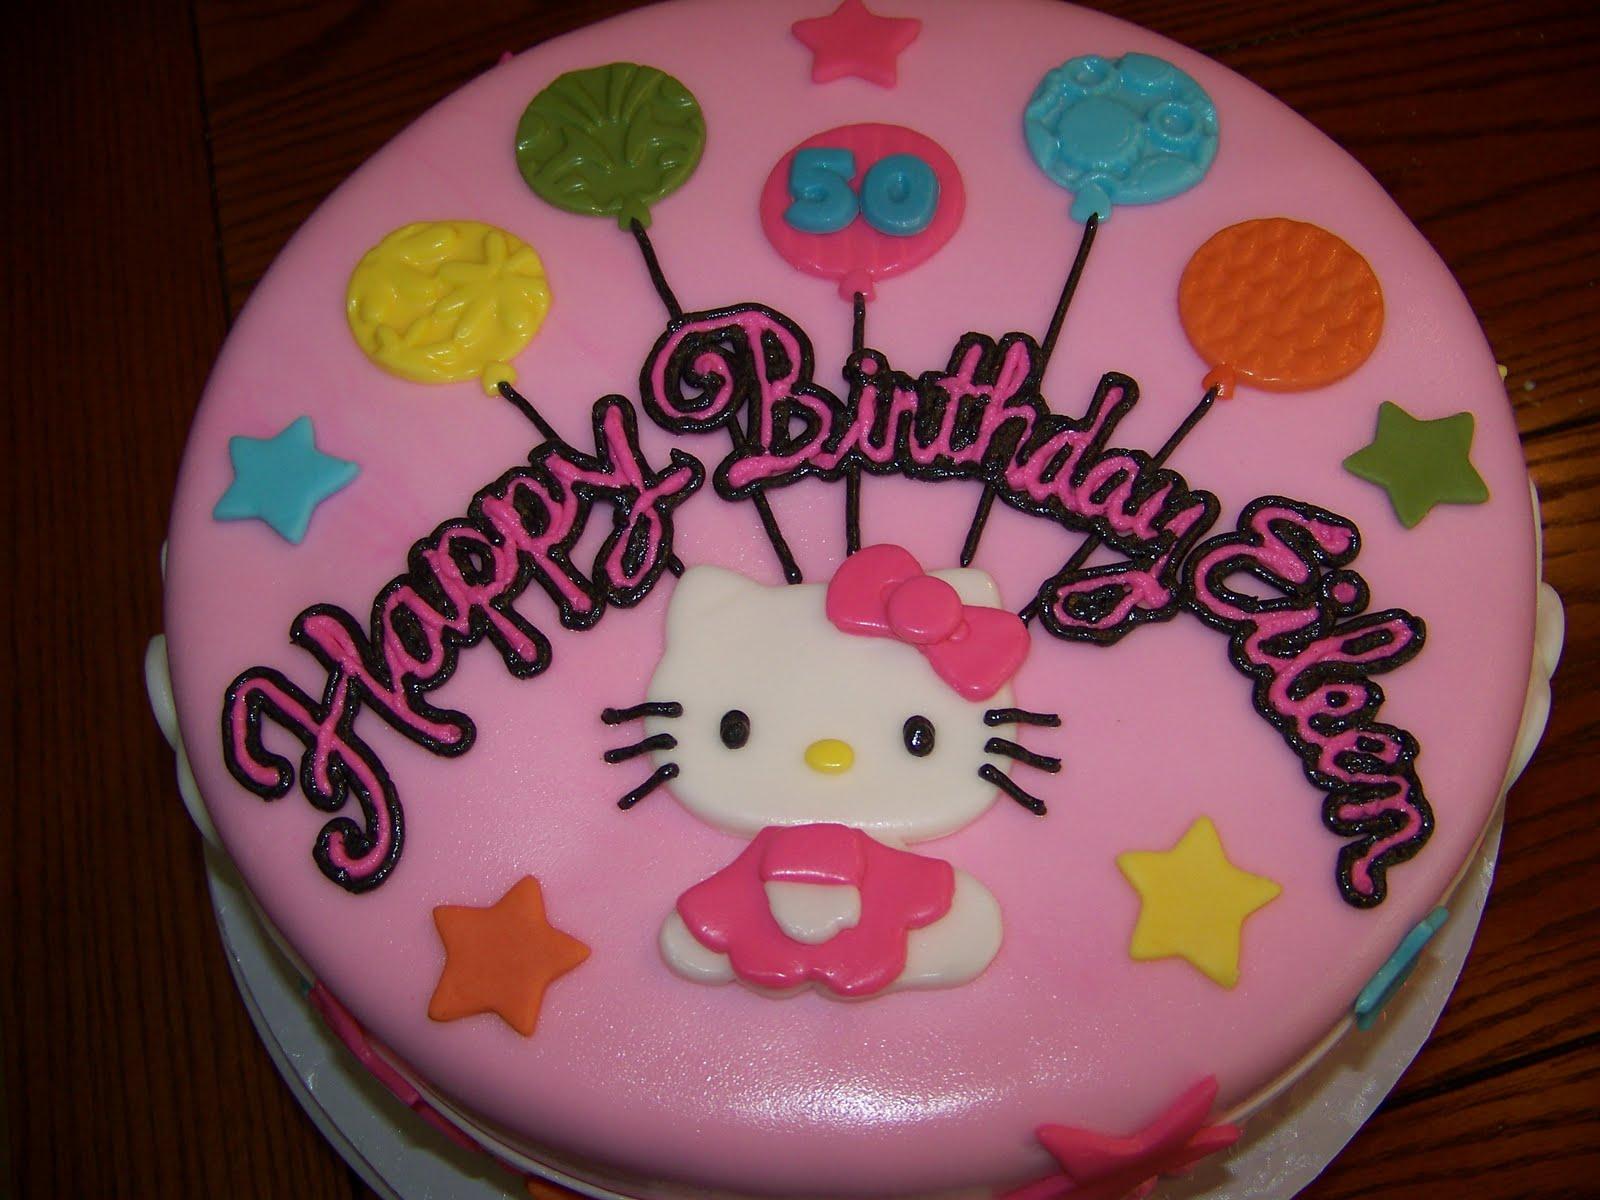 Astonishing 11 Teen Hello Kitty Cakes Photo Zebra Birthday Hello Kitty Funny Birthday Cards Online Alyptdamsfinfo